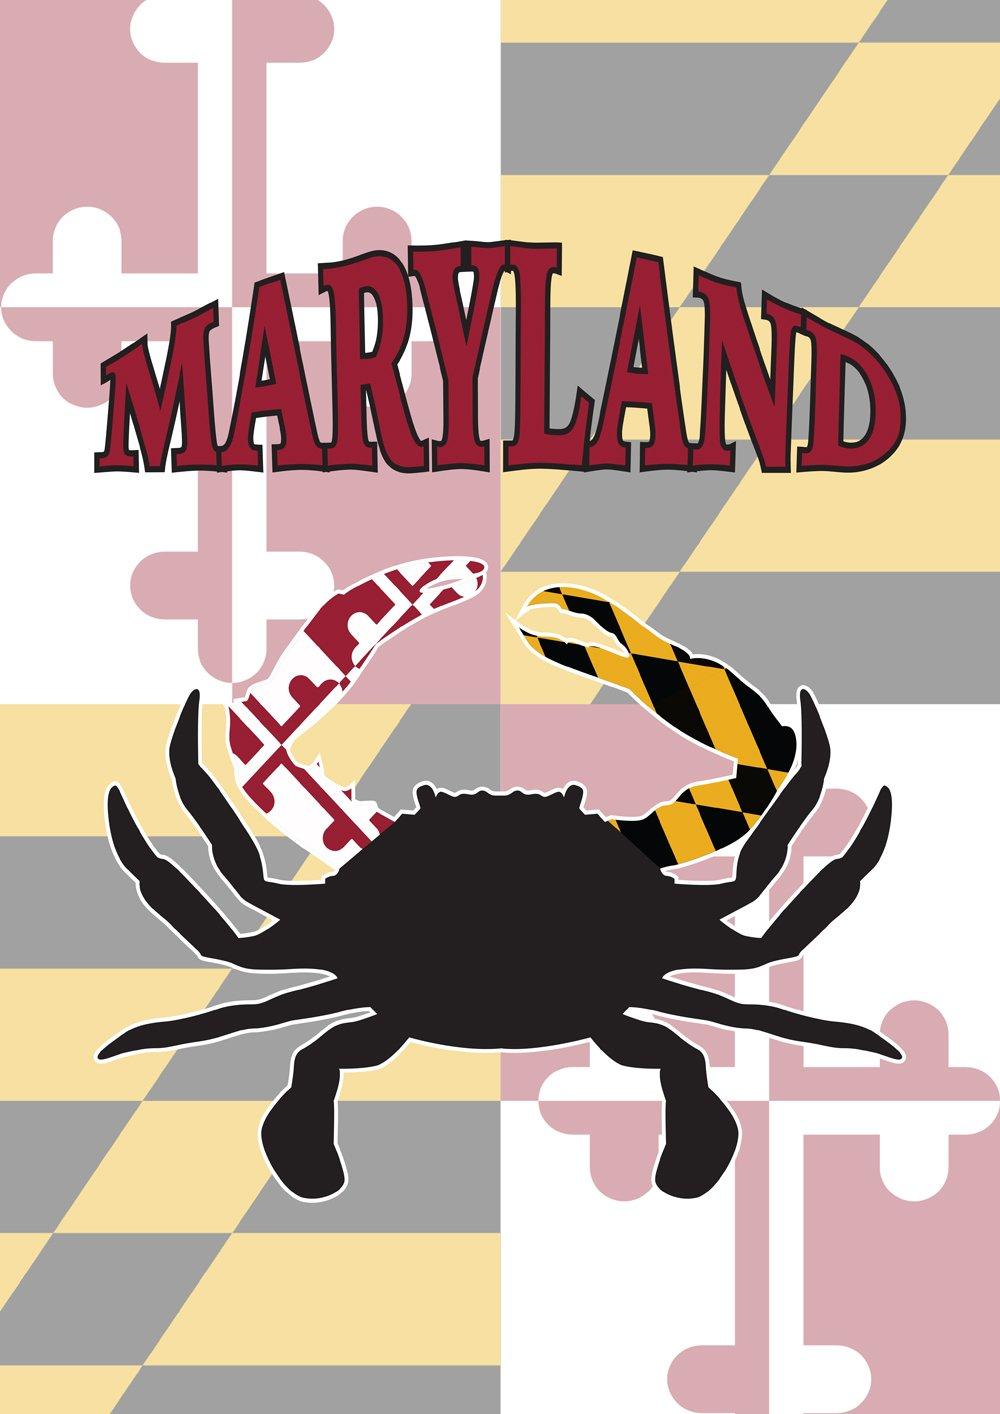 "Toland Home Garden Maryland Crab Decorative Garden Flag 12.5 by 18"" State Blue Crustacean, Garden-Small-12.5x18"